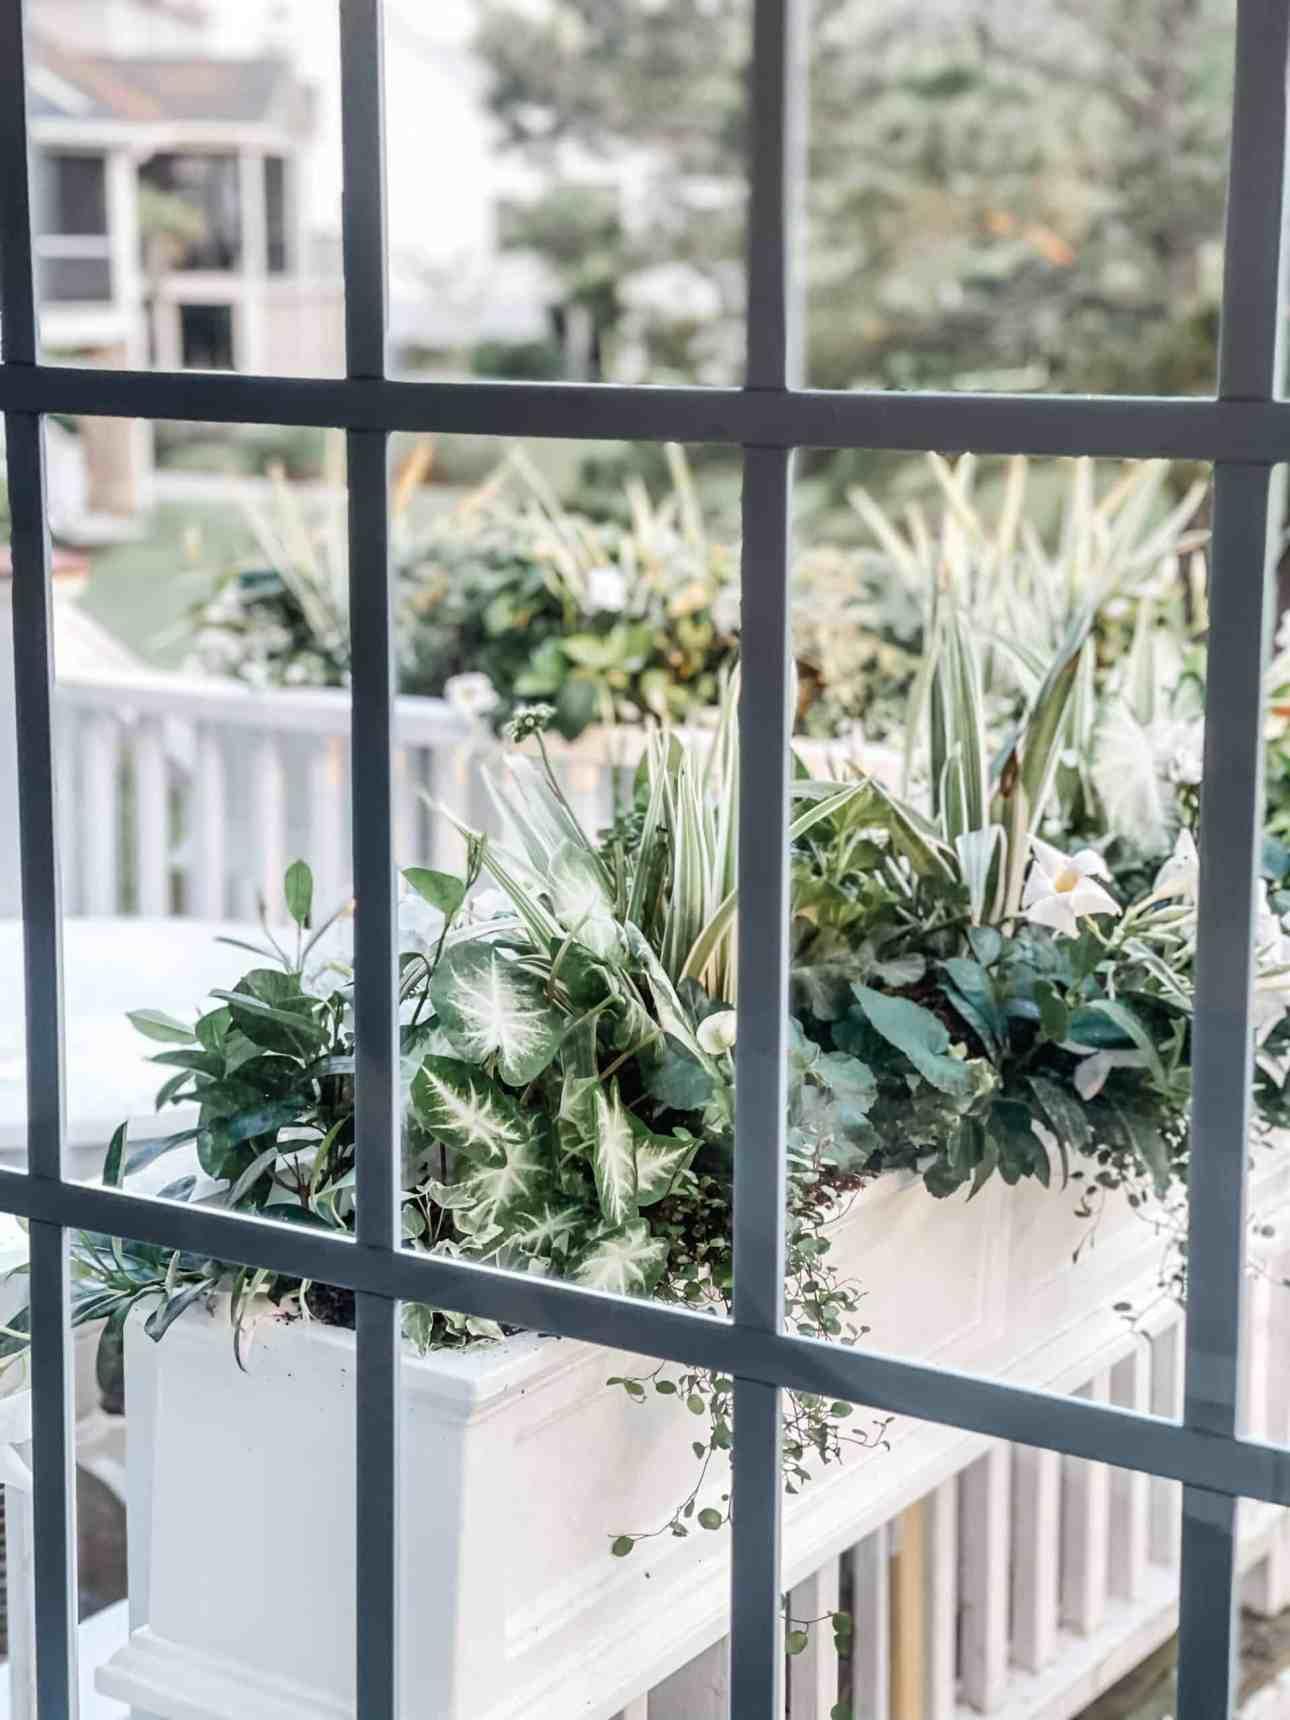 Window box with green shade plants.